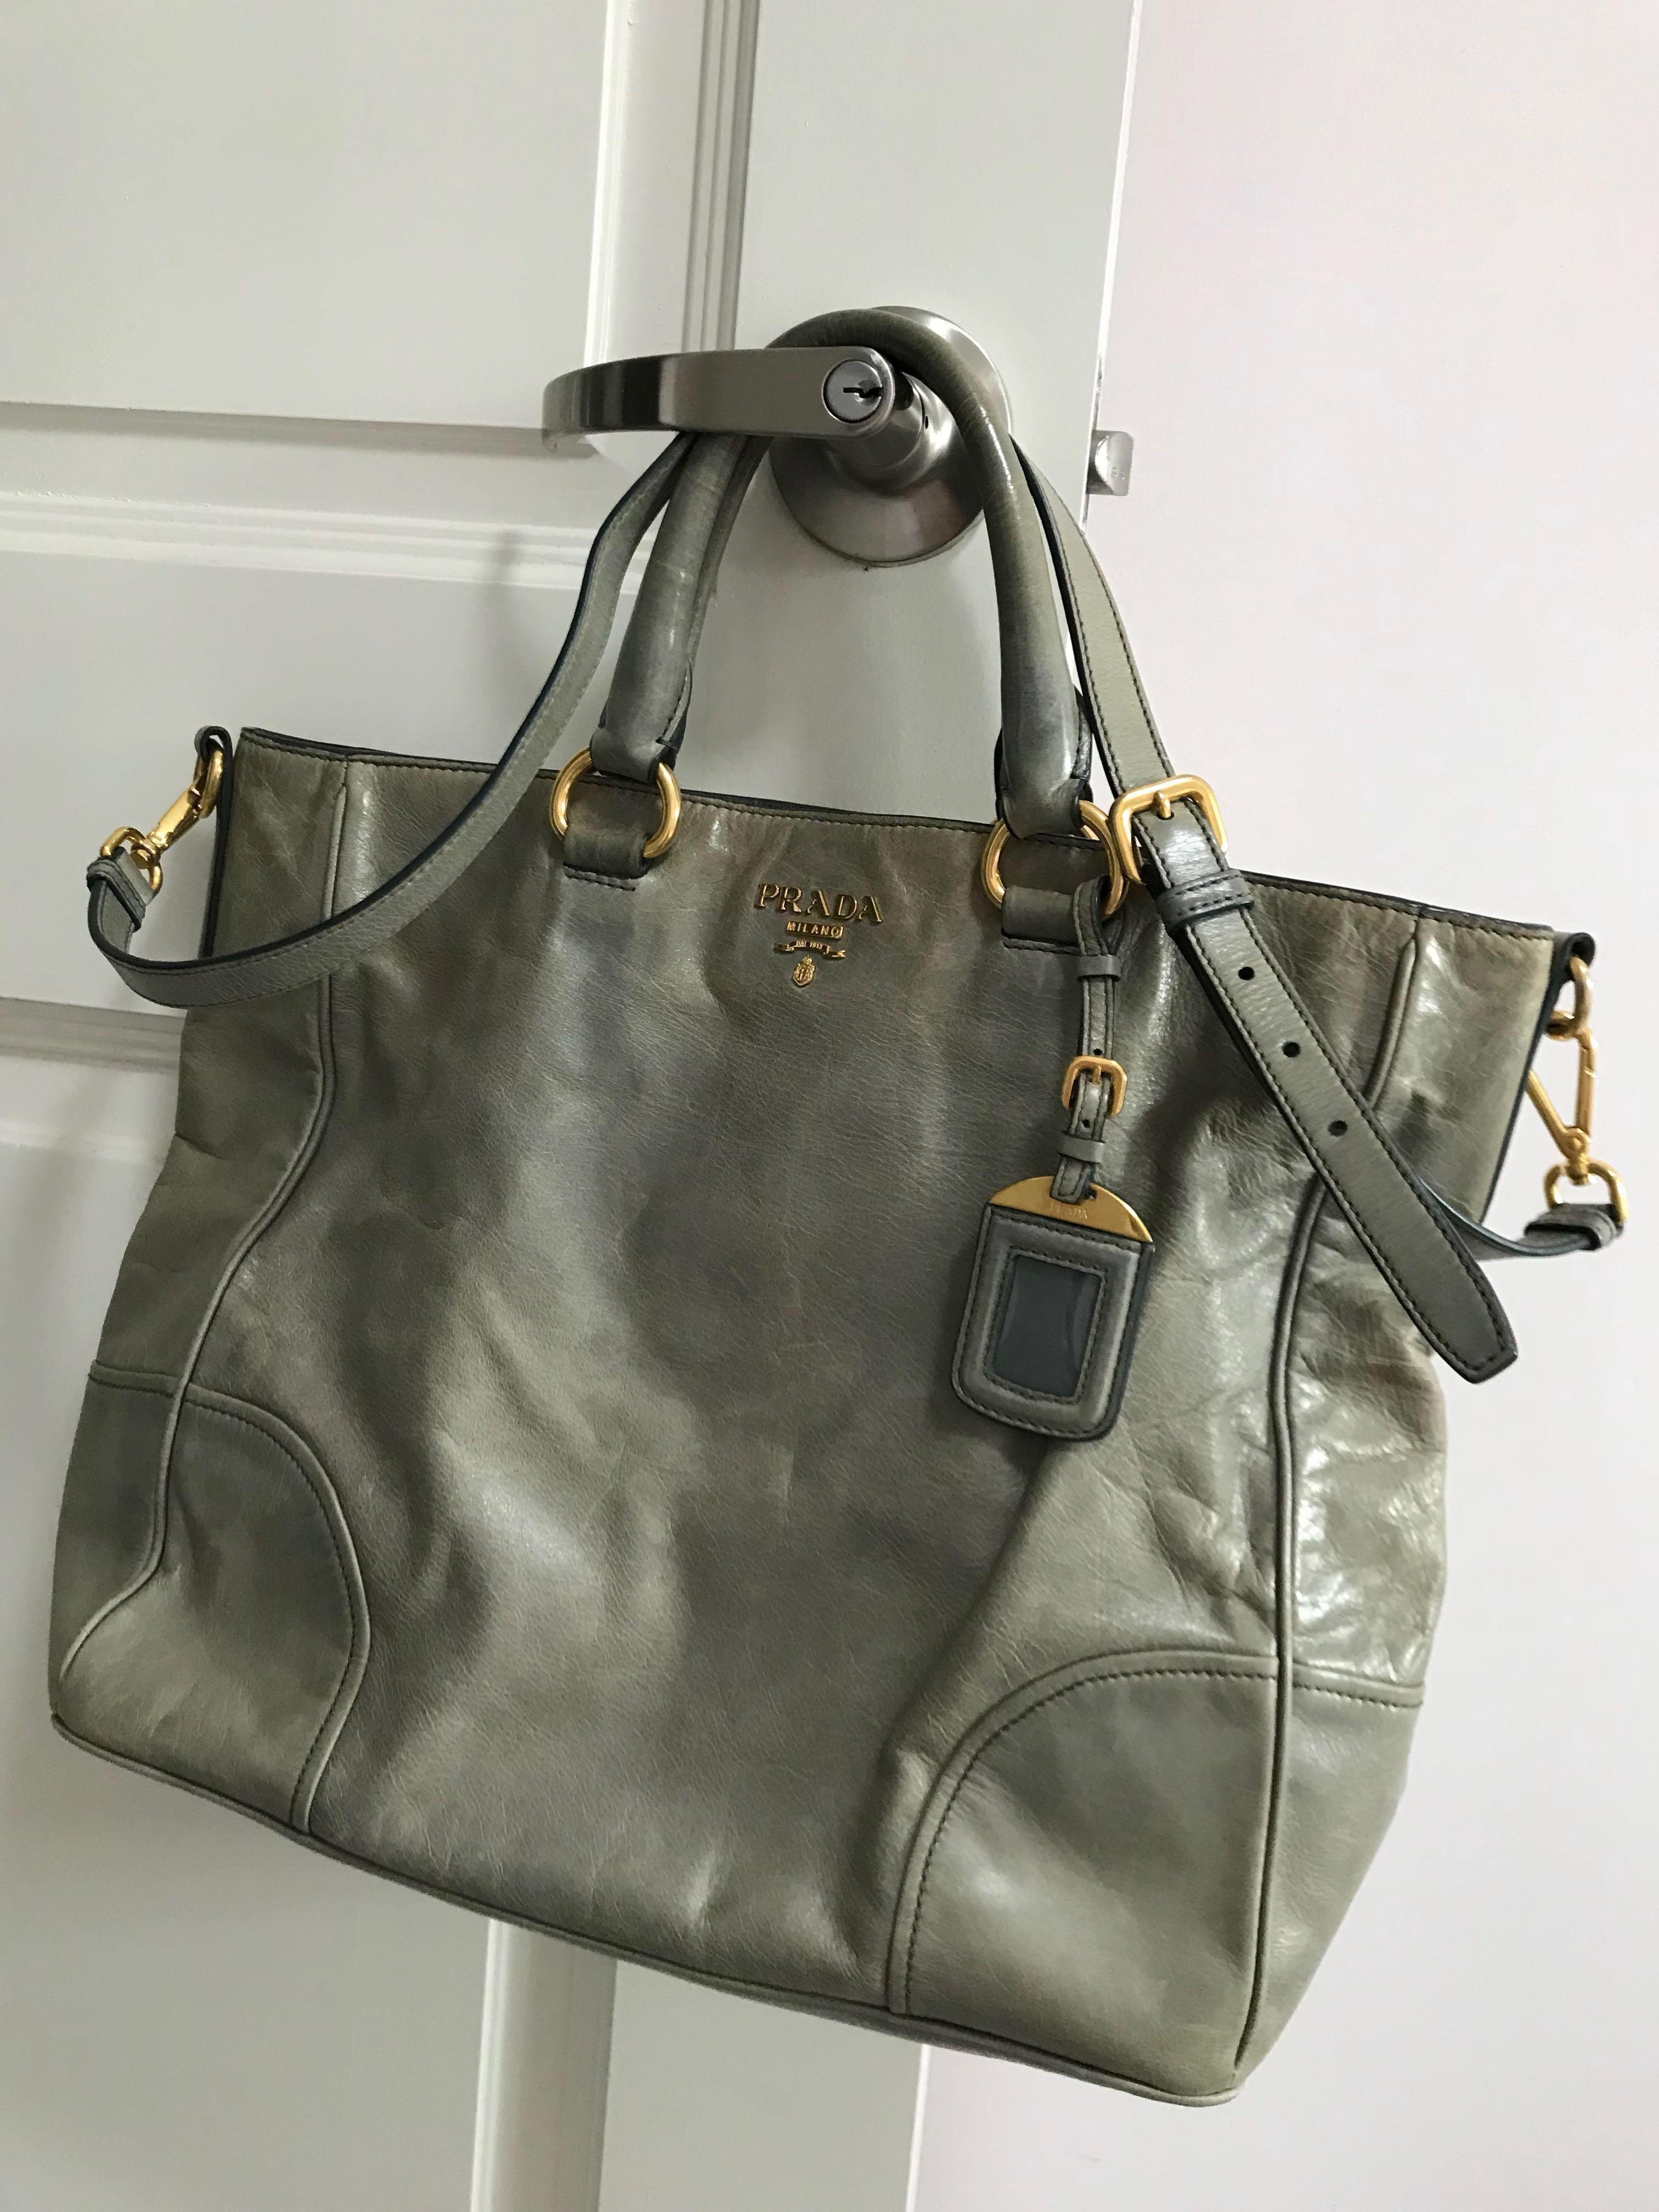 5f4079c2b7da Authentic Vintage Prada Bag - Used, Women's Fashion, Bags & Wallets ...